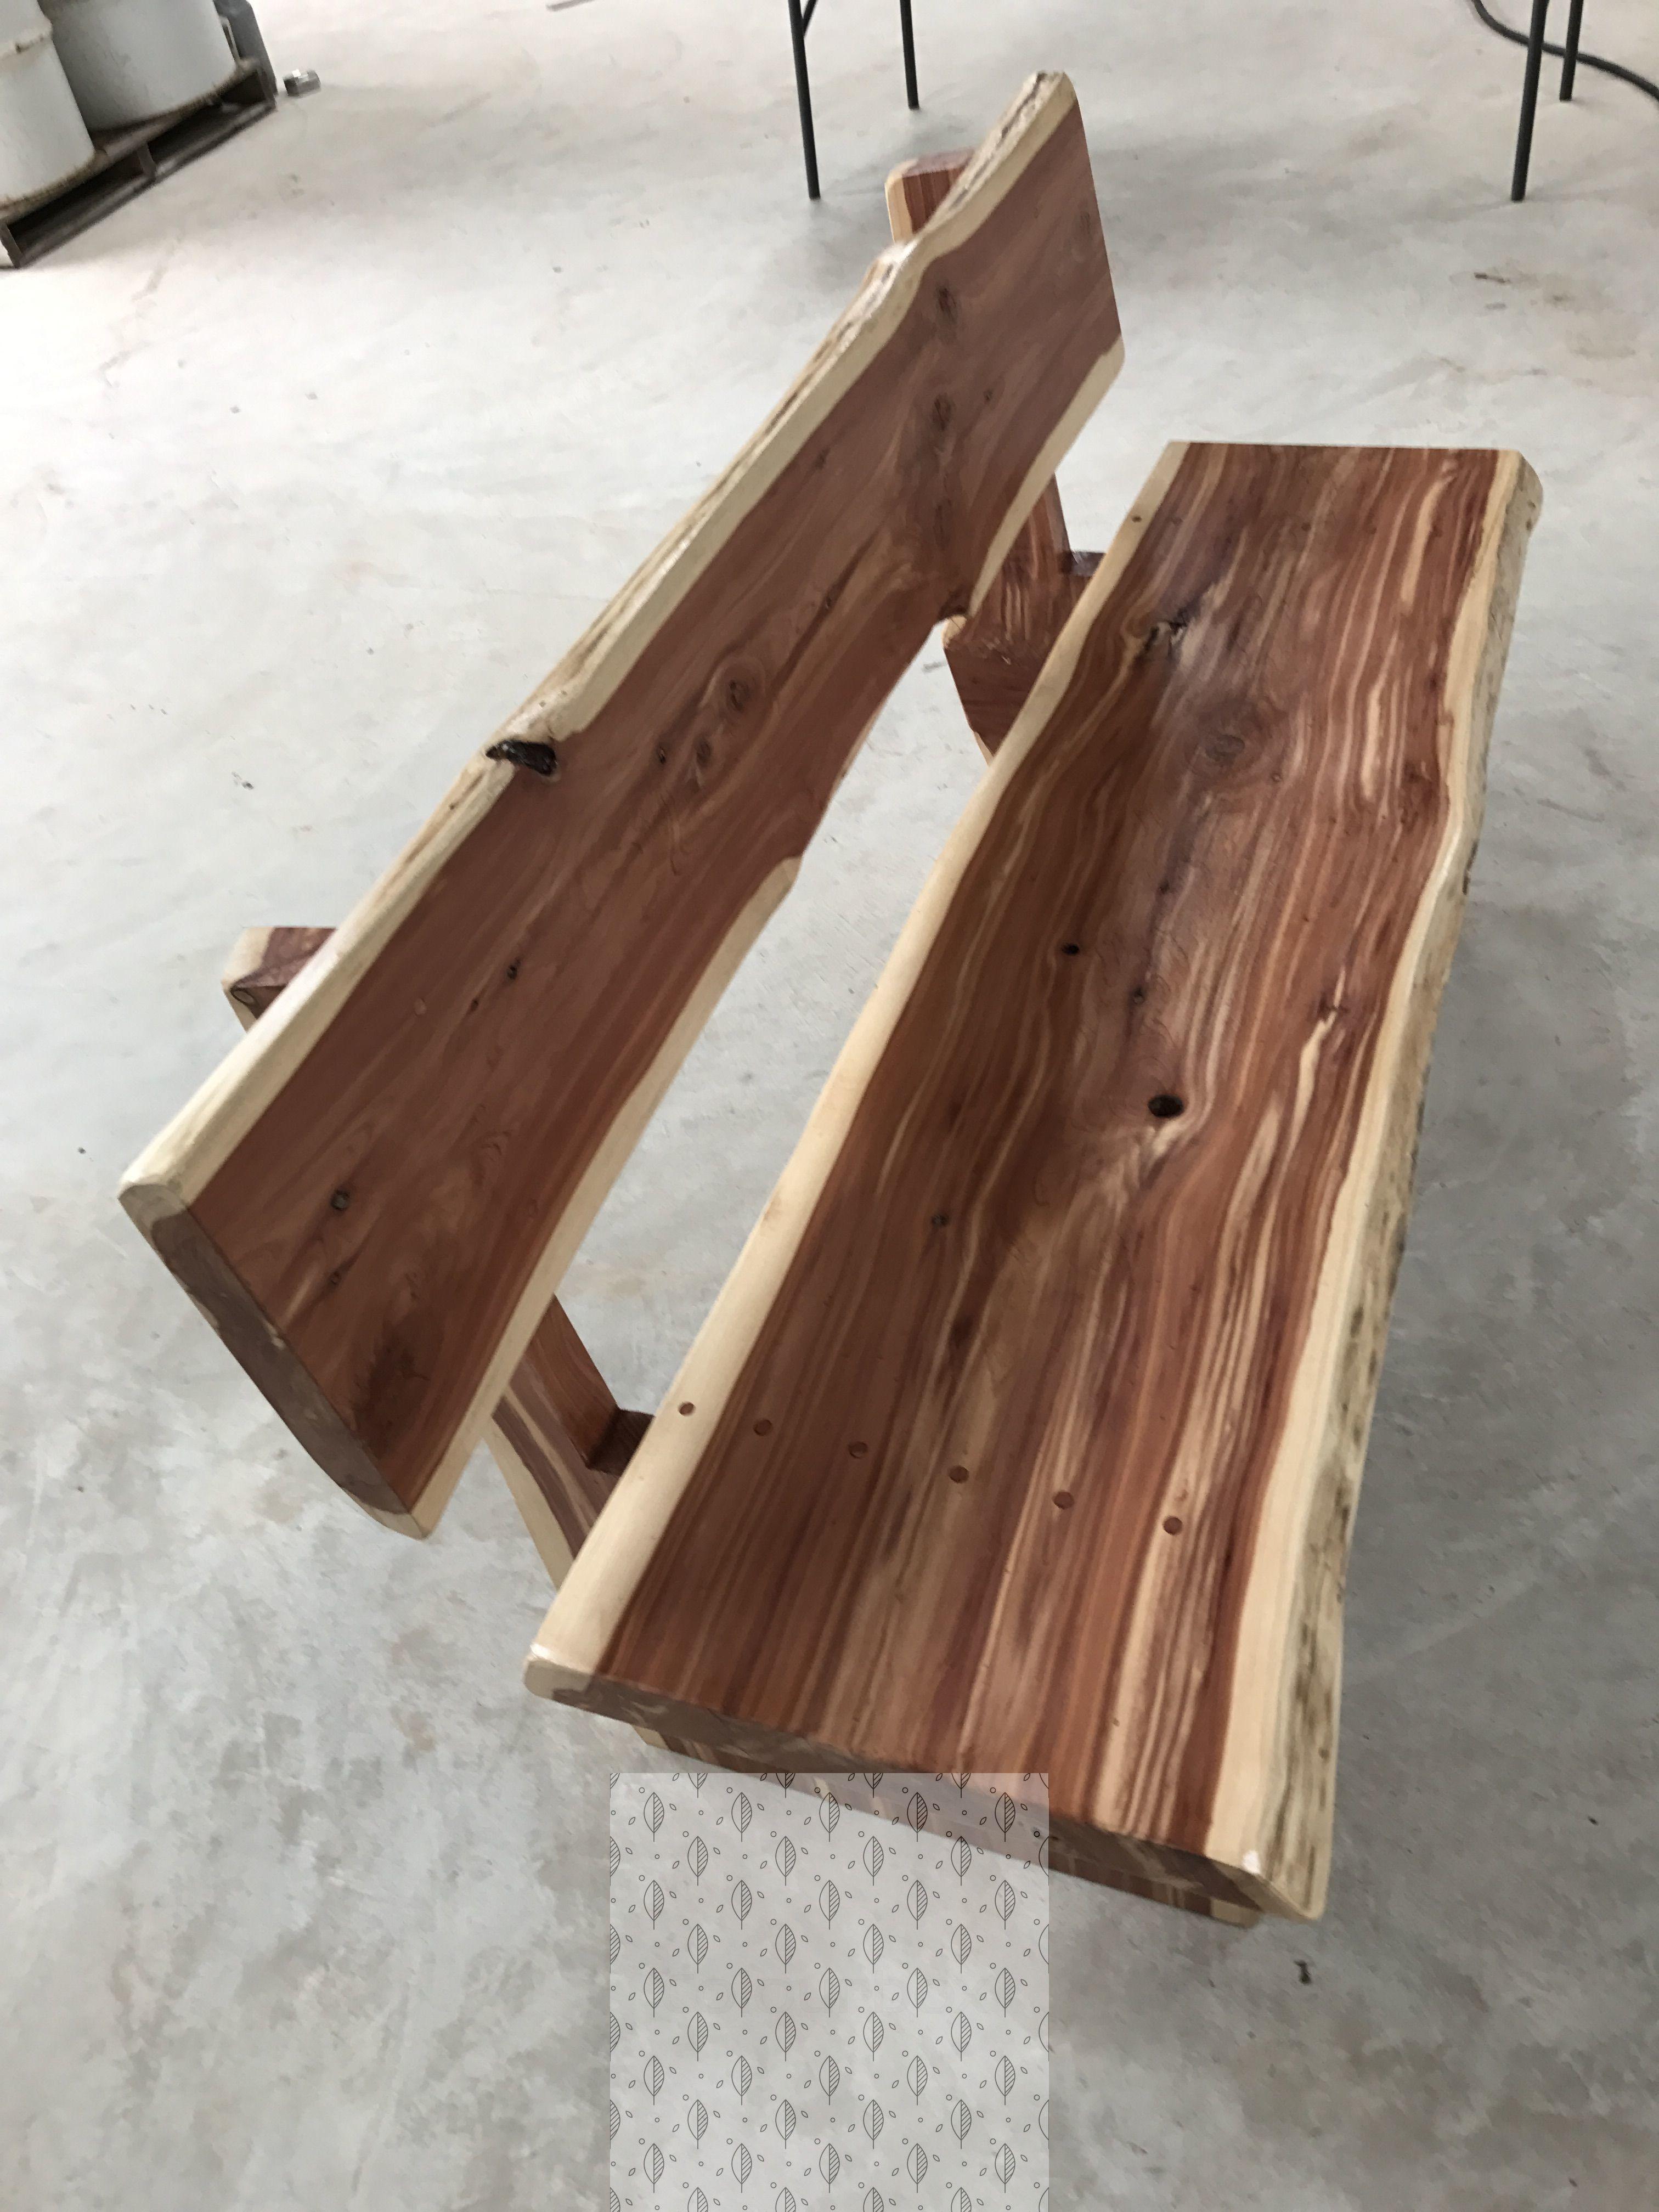 16 Awe Inspiring Wood Working Bench Decks Ideas In 2020 Cedar